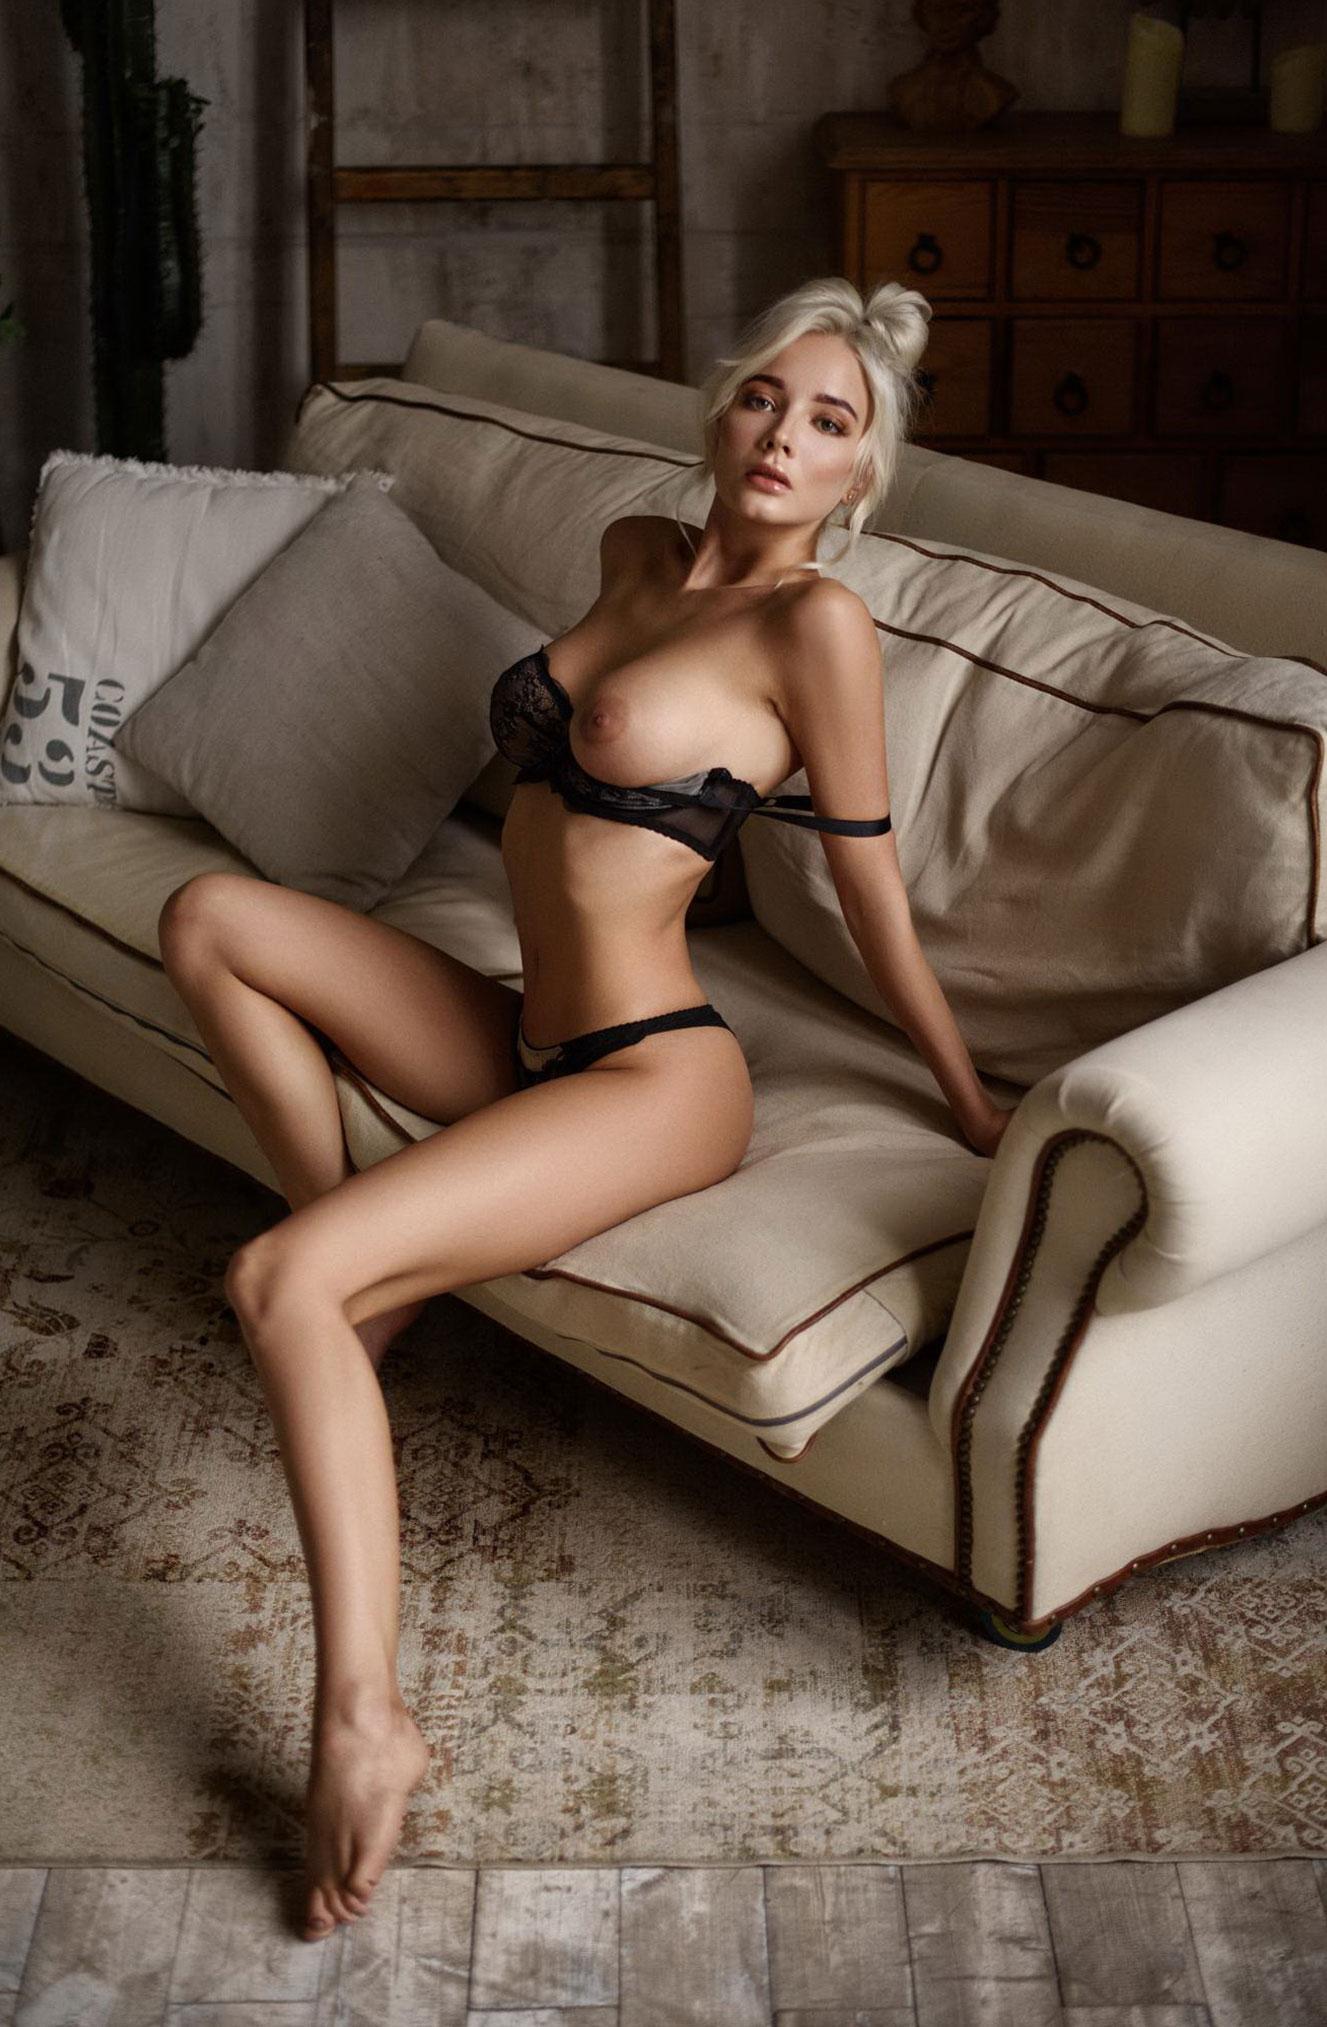 Екатерина Ширяева - голая, но в галстуке / фото 06